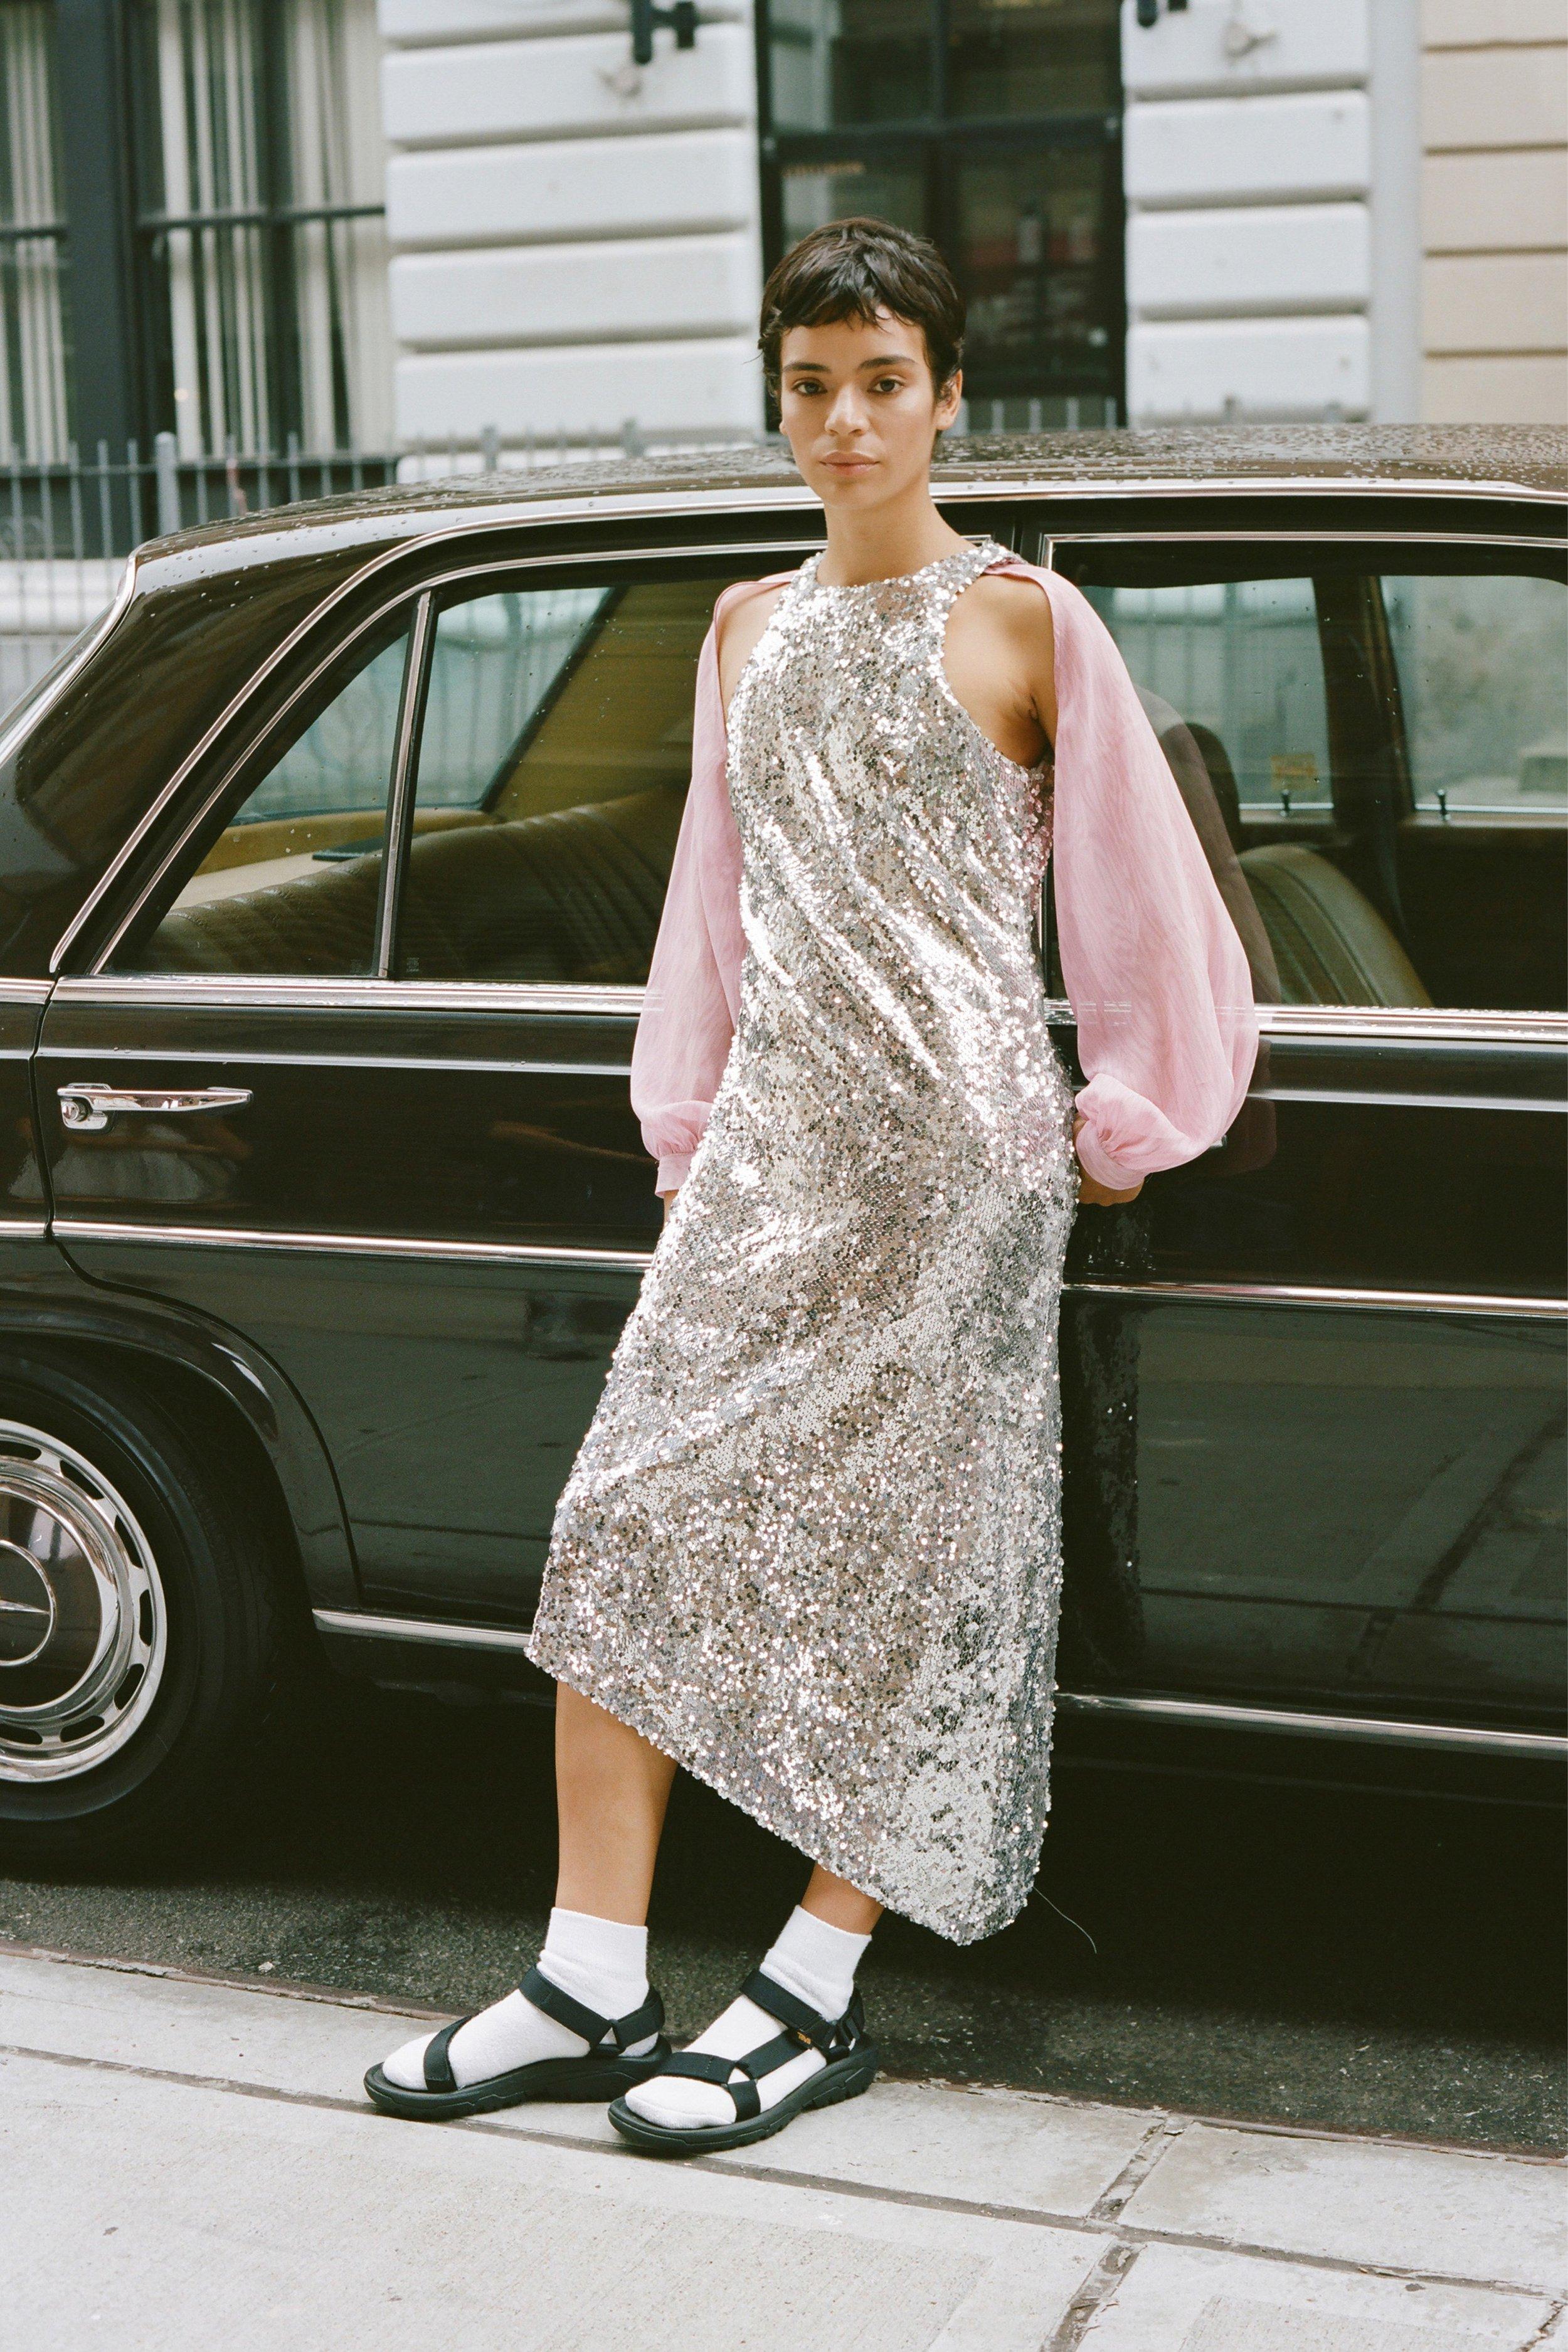 00028-sandy-liang-spring-2019-ready-to-wear.jpg